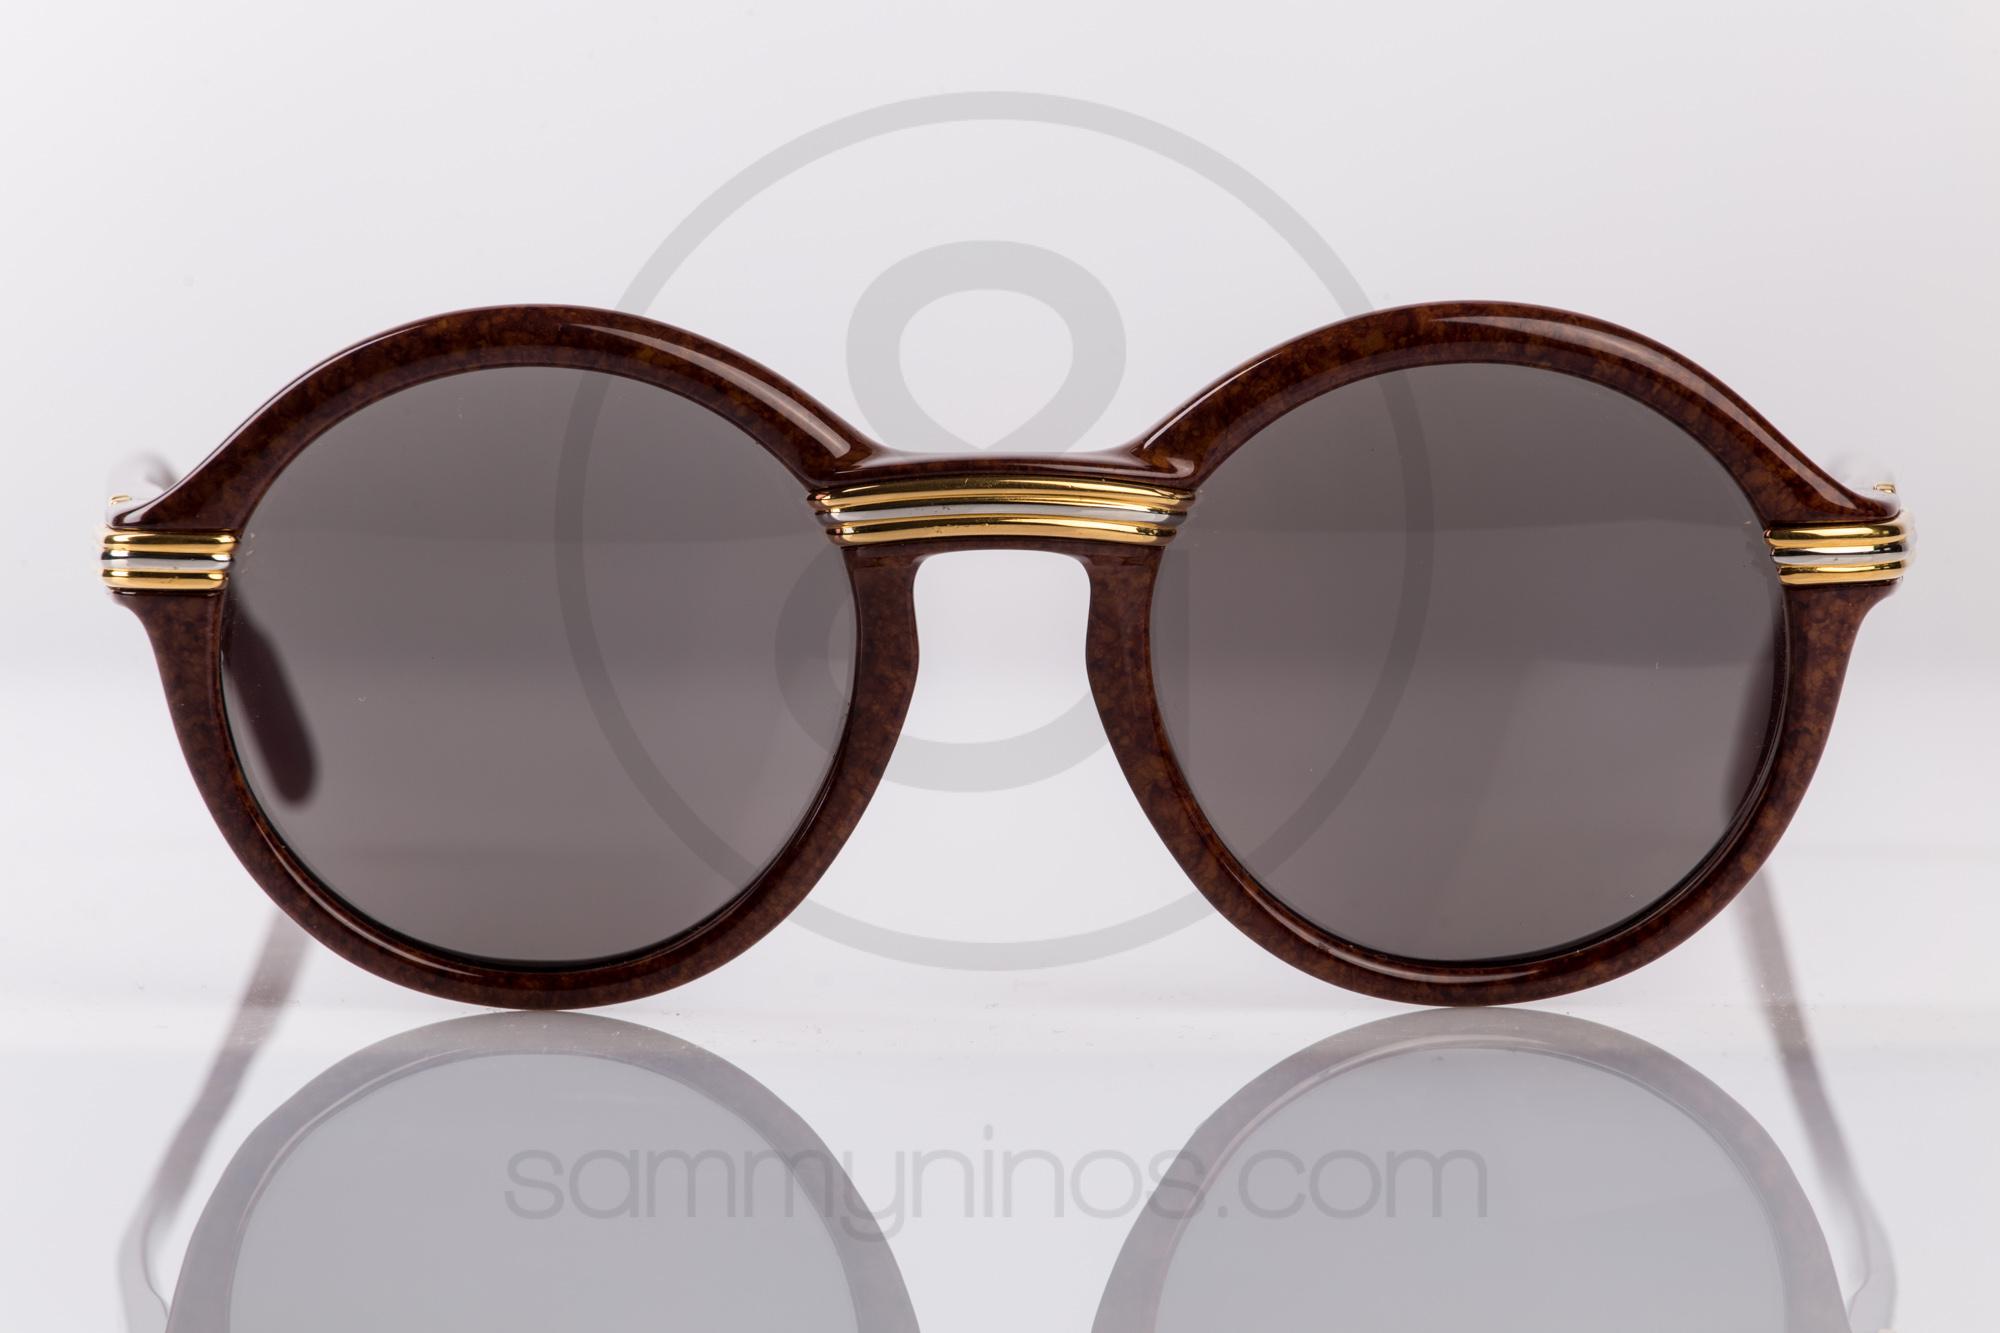 1205847774b Cartier Cabriolet Louis 49-20 – Sammy   Nino s Store